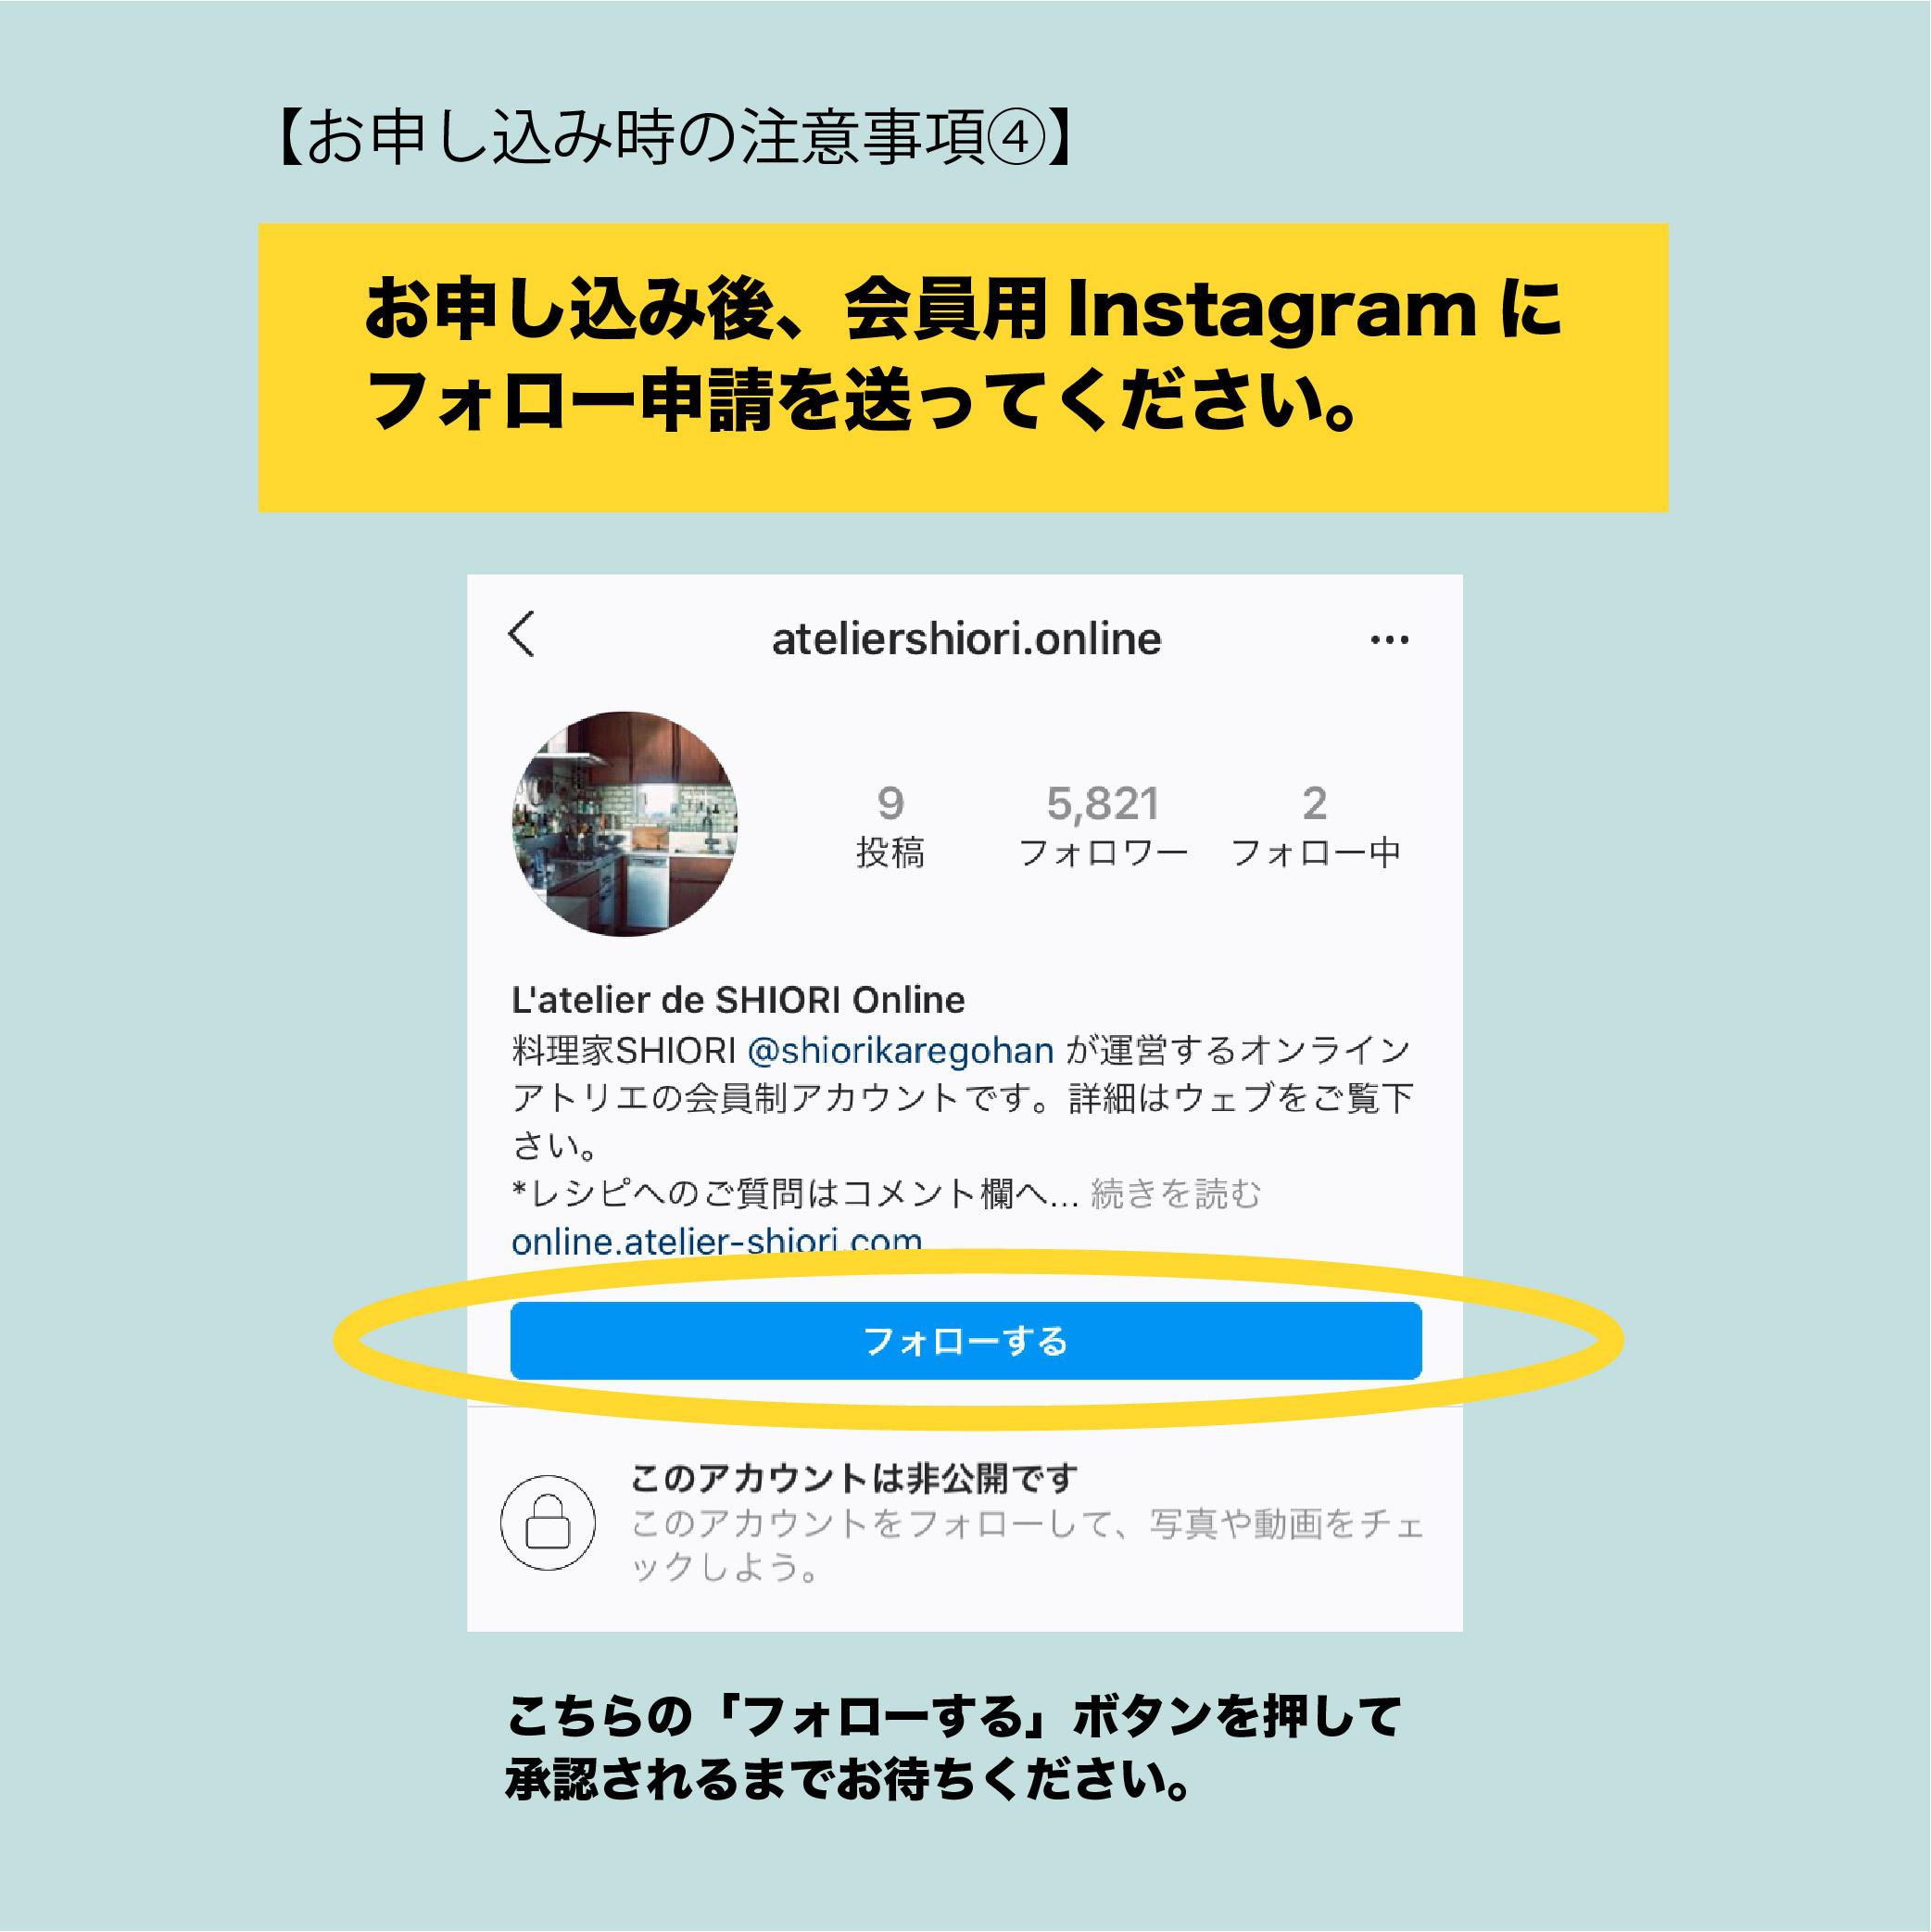 L'atelier de SHIORI Online 会員専用Instagram参加申し込み(月額 3,900円 [税込 4,290円] / 毎月引き落とし)